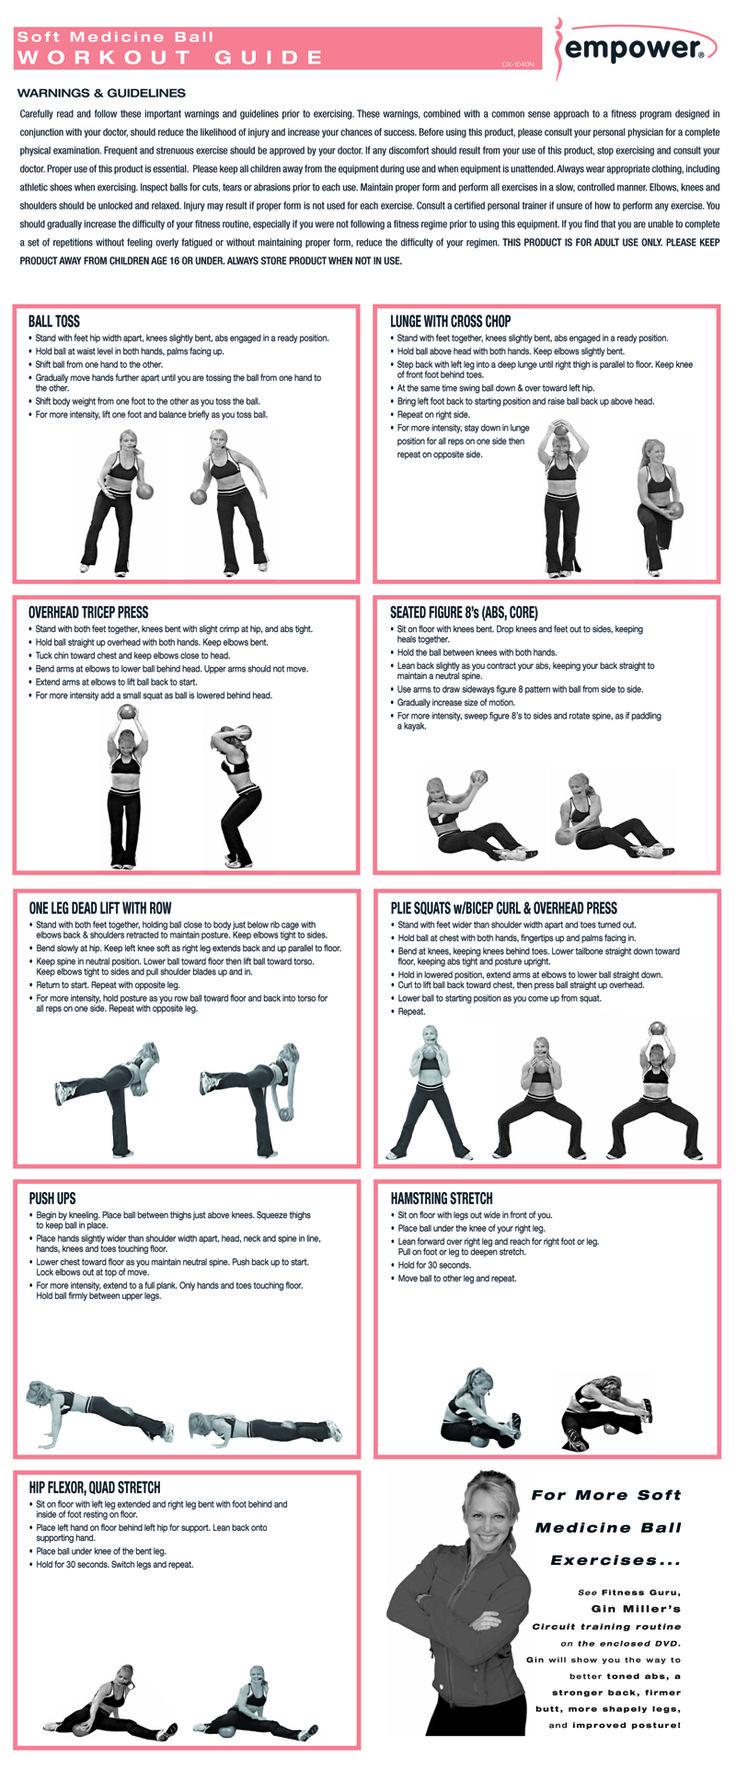 #medicineballs #medicineballworkout #abs #glutes #butt #workout #athome #fitness